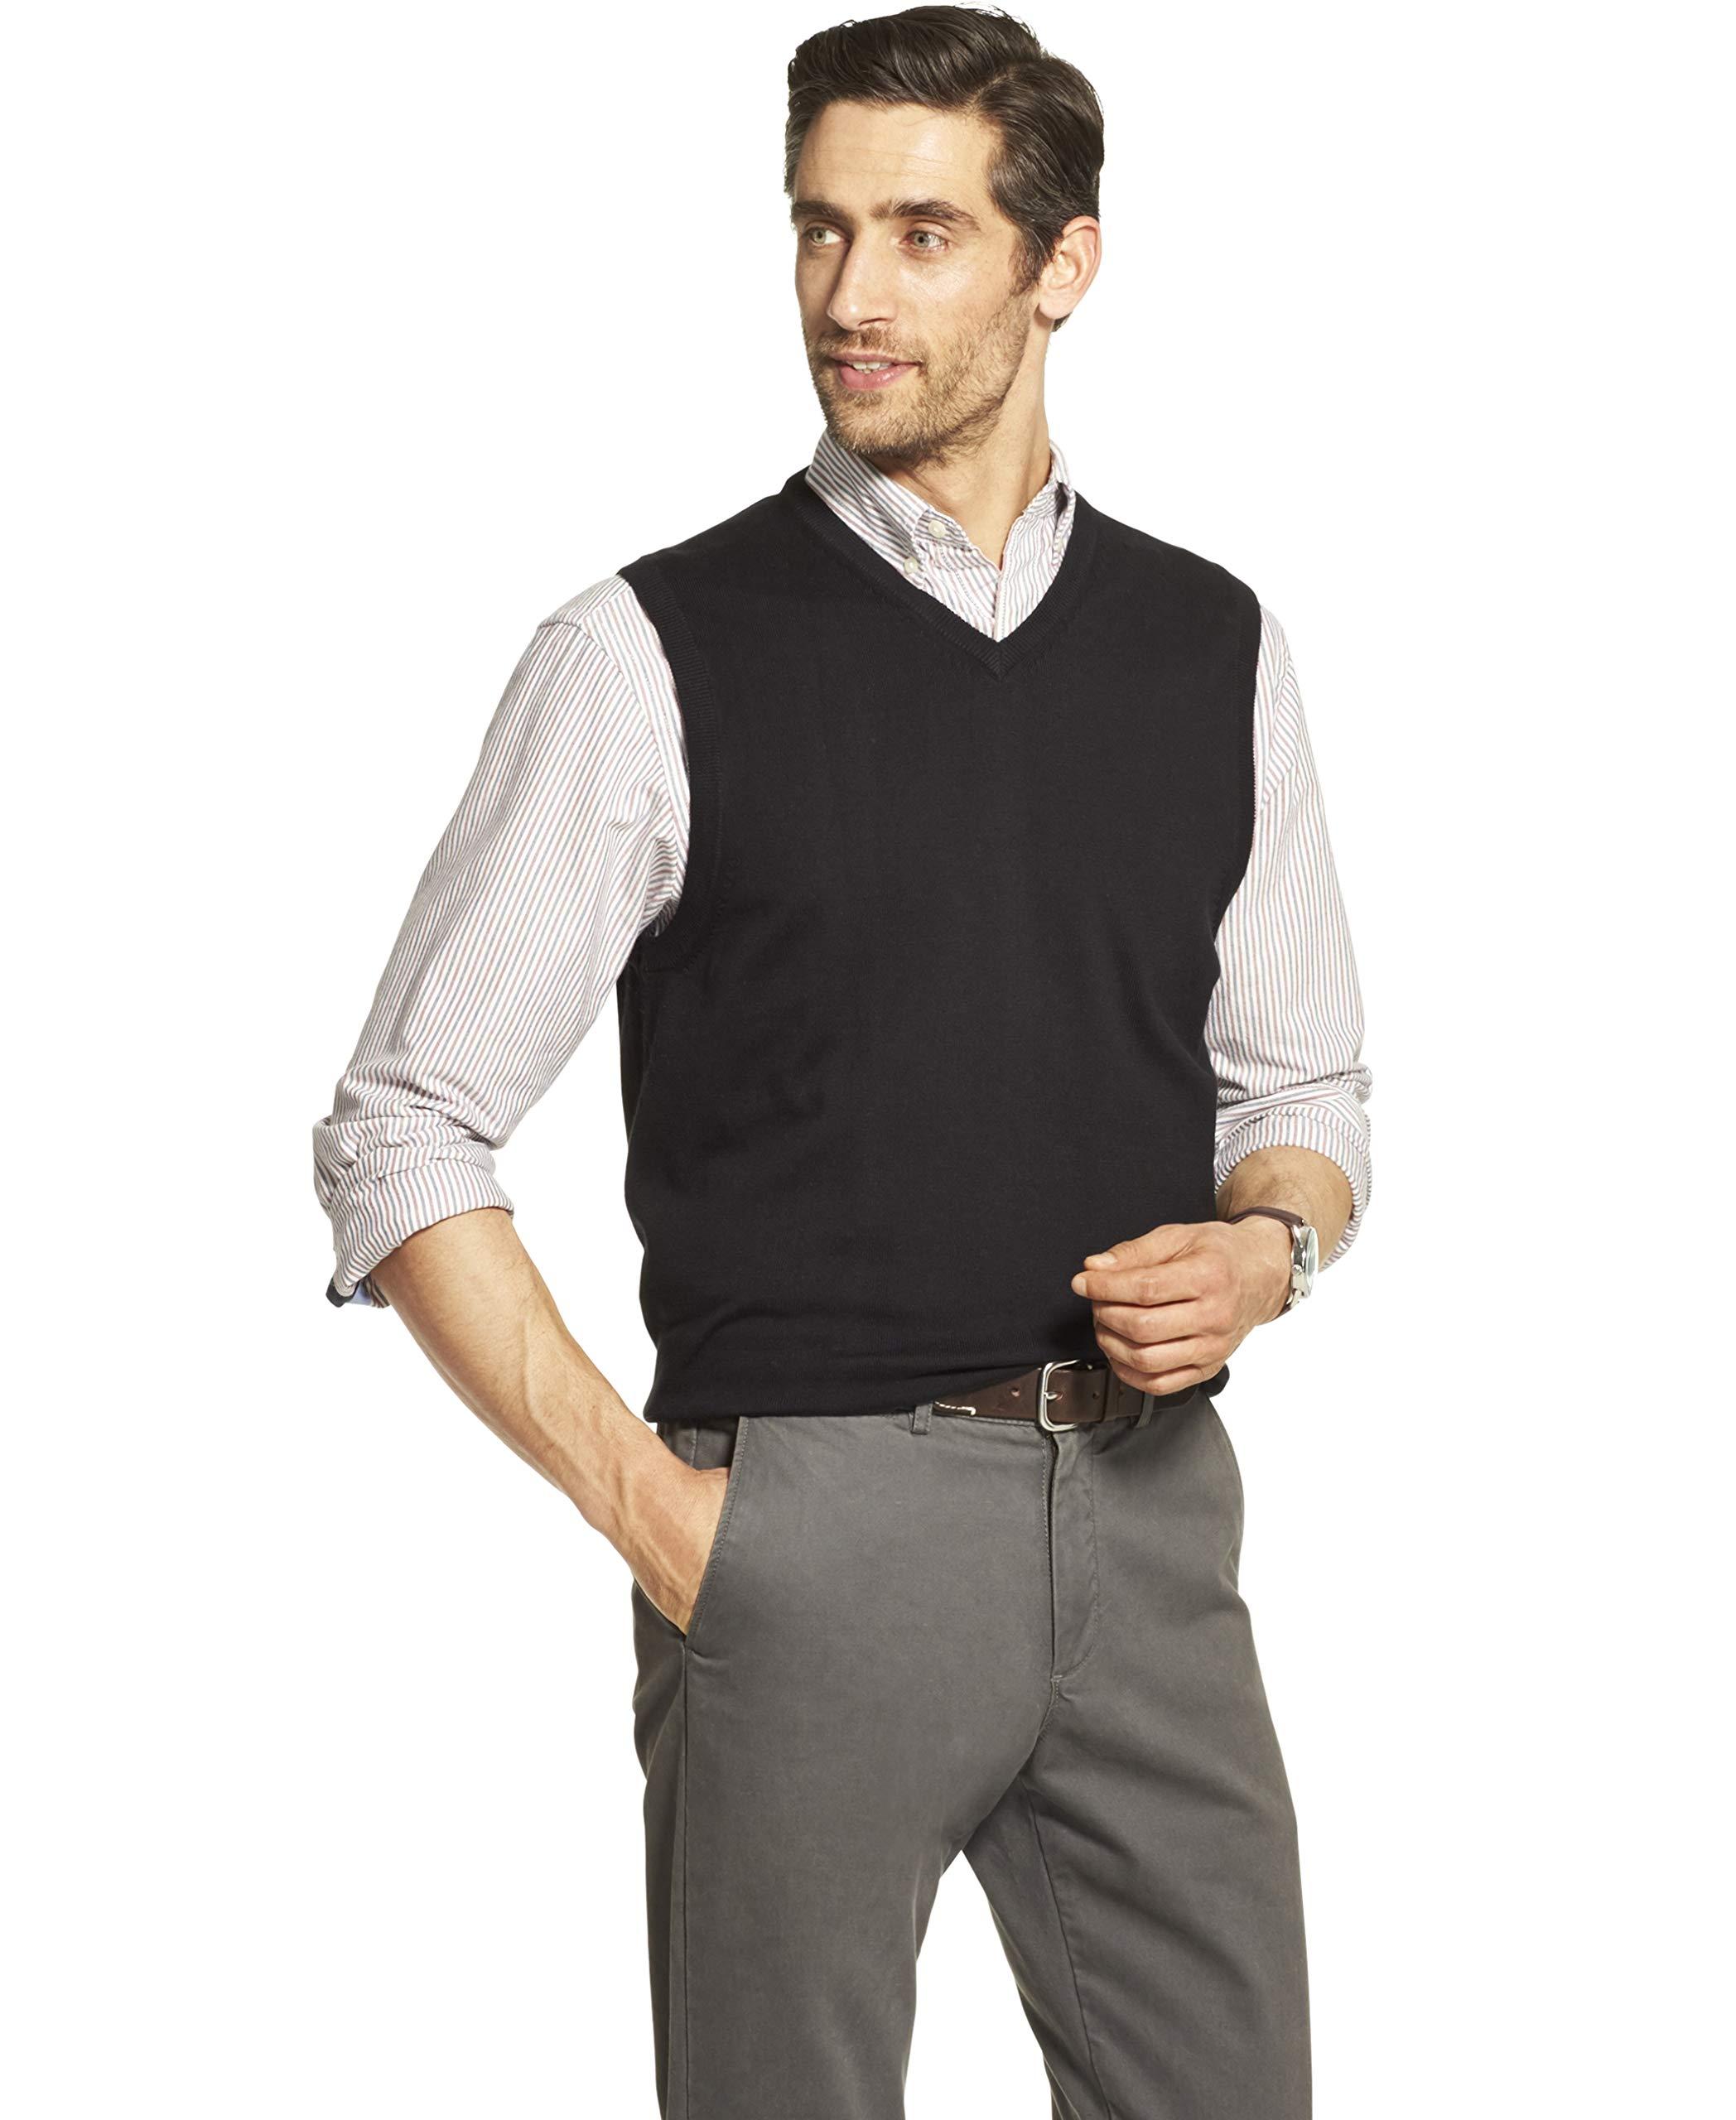 IZOD Men's Premium Essentials Solid V-Neck 12 Gauge Sweater Vest, BLACK, XX-Large by IZOD